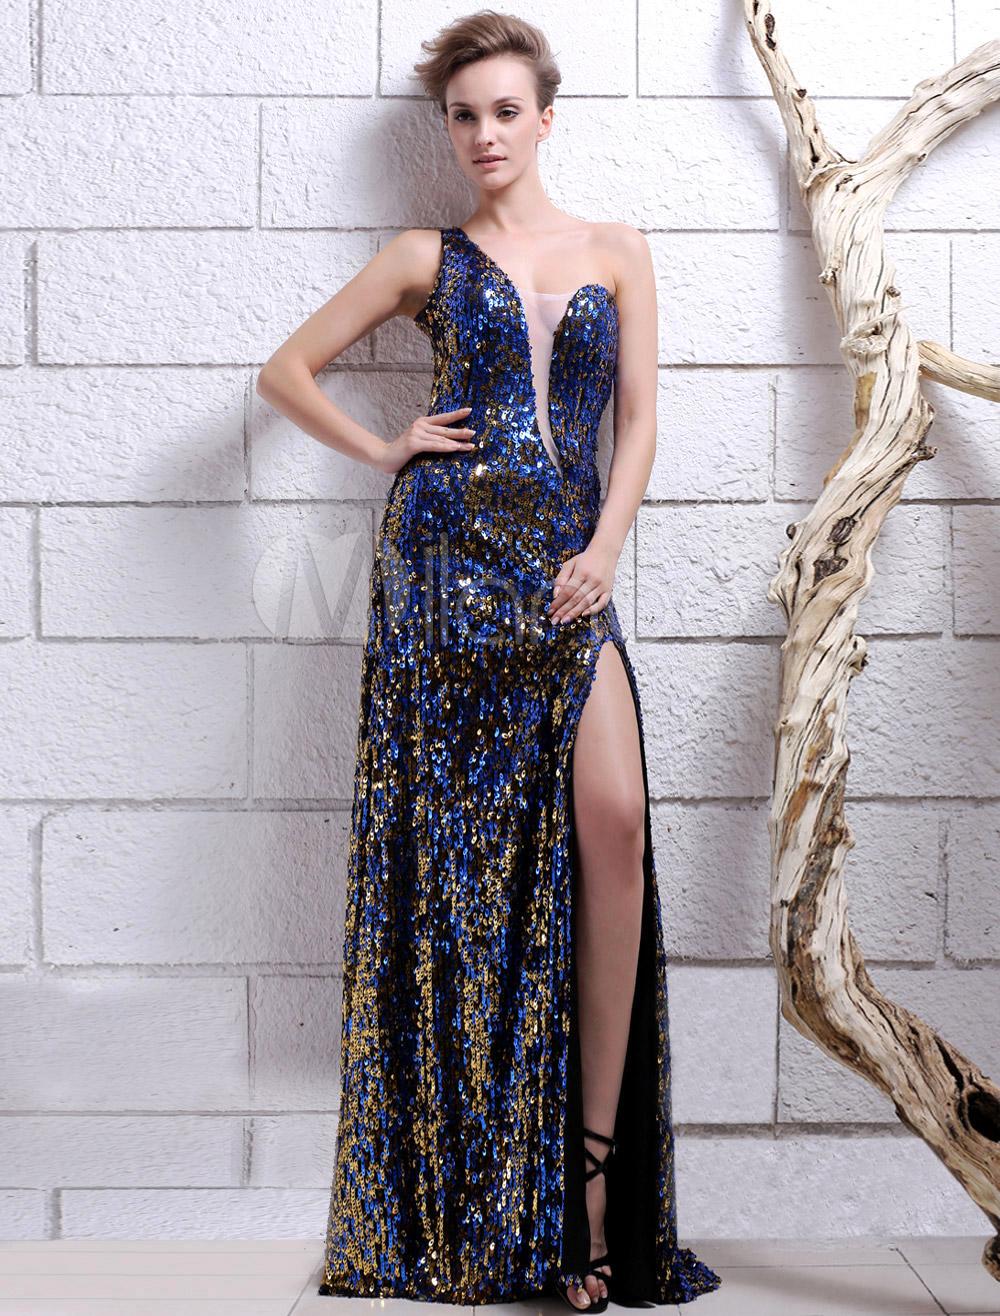 Royal Blue One-Shoulder Sequin Sheath Sequined Evening Dress  Milanoo